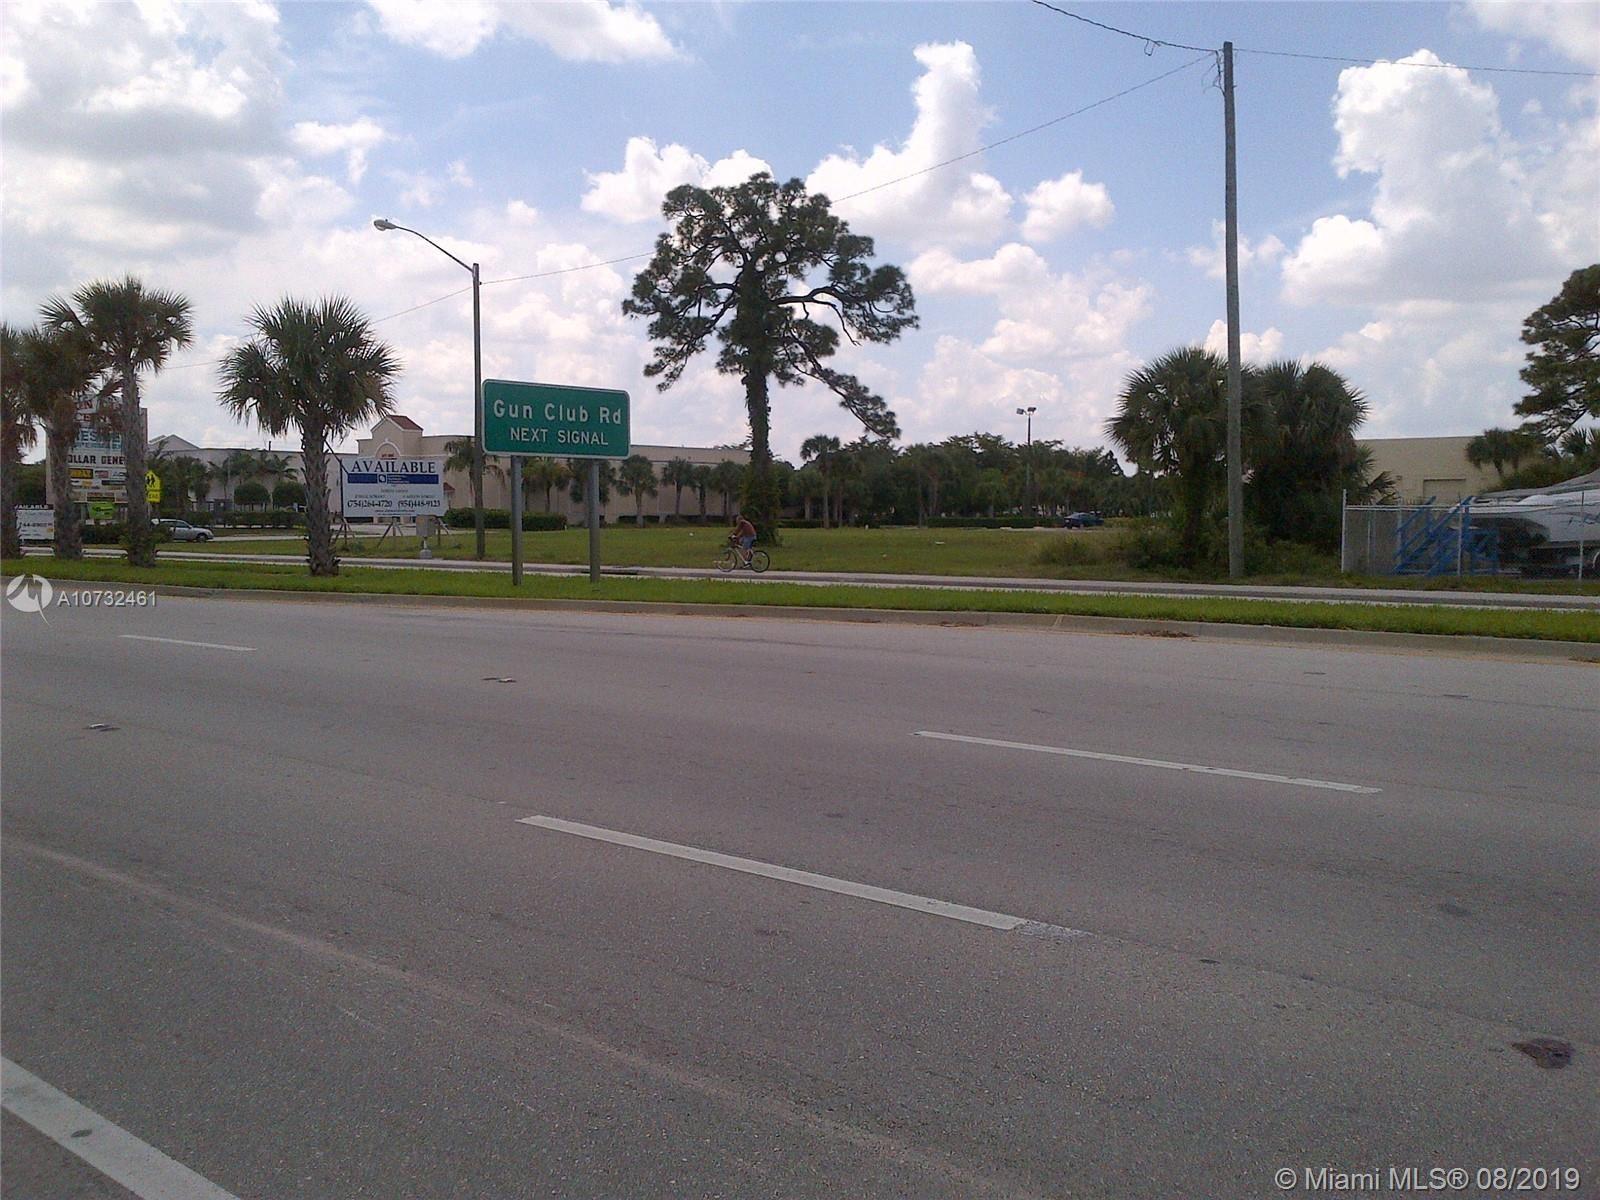 181 S Military Trl, West Palm Beach, FL 33415 - #: A10732461